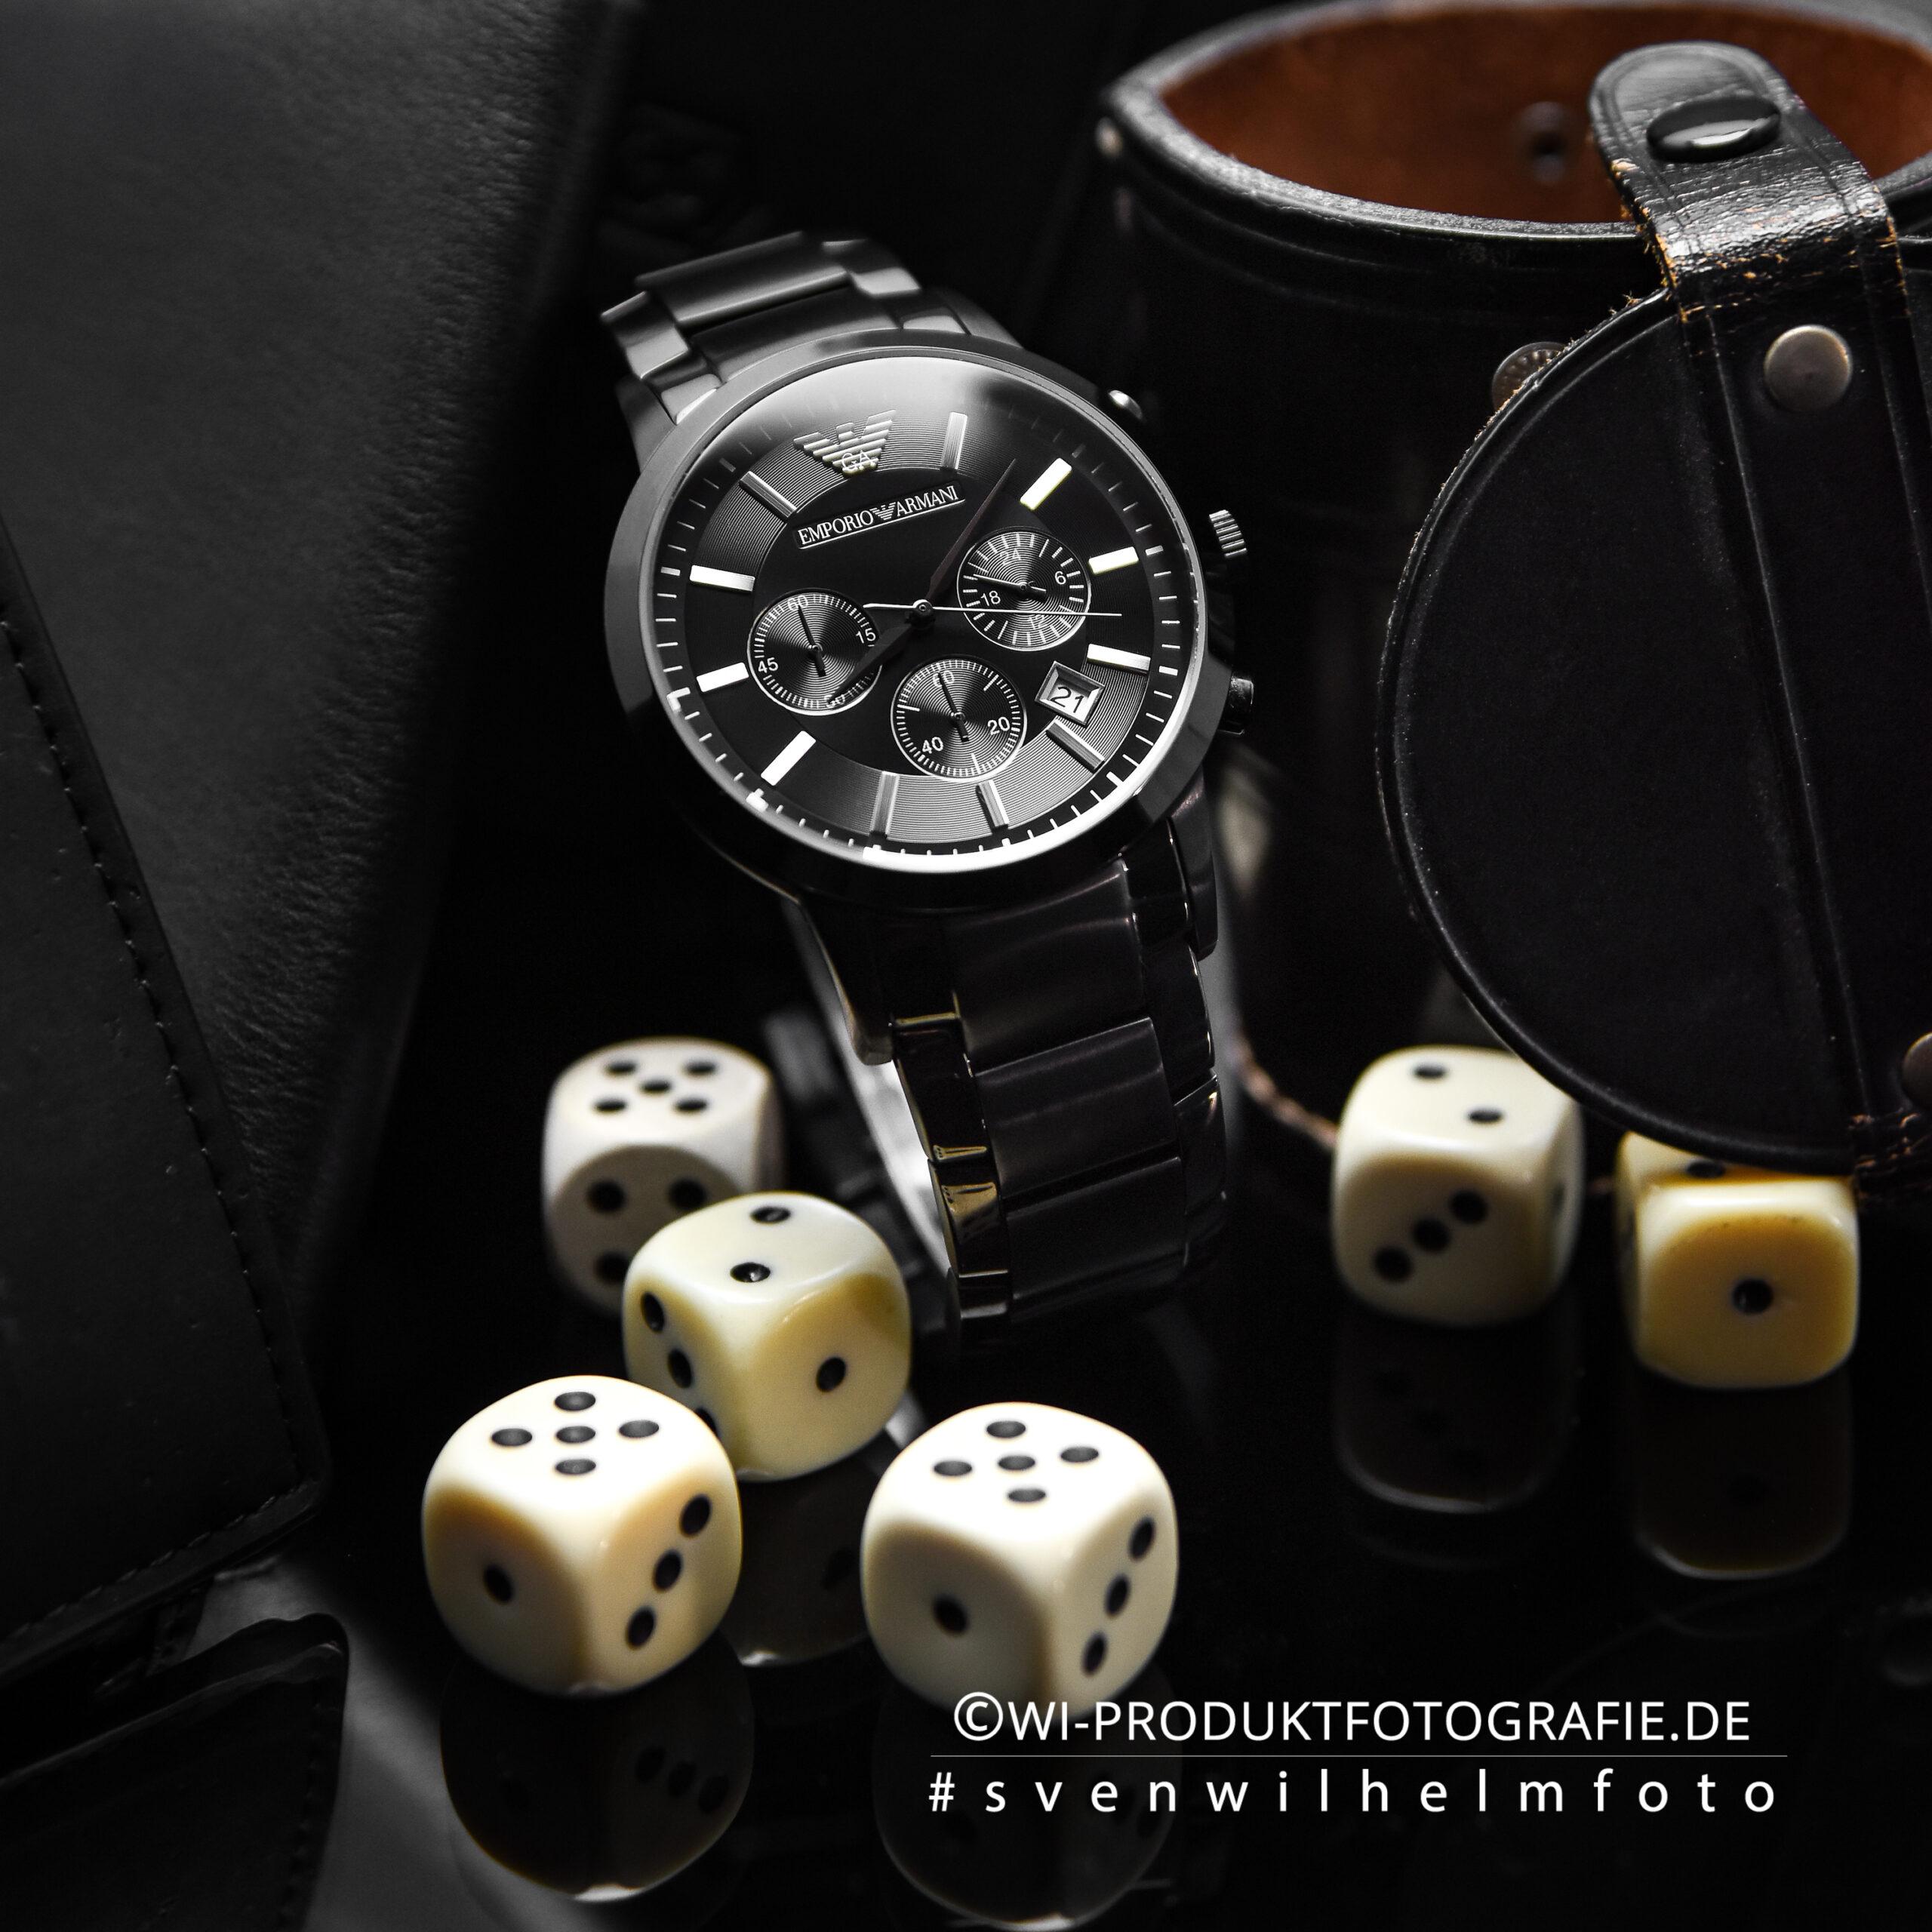 Uhrenfotograf Emporio Armani 4730 Uhren Fotograf Uhrenfotografie Professioneller Fotograf Uhren